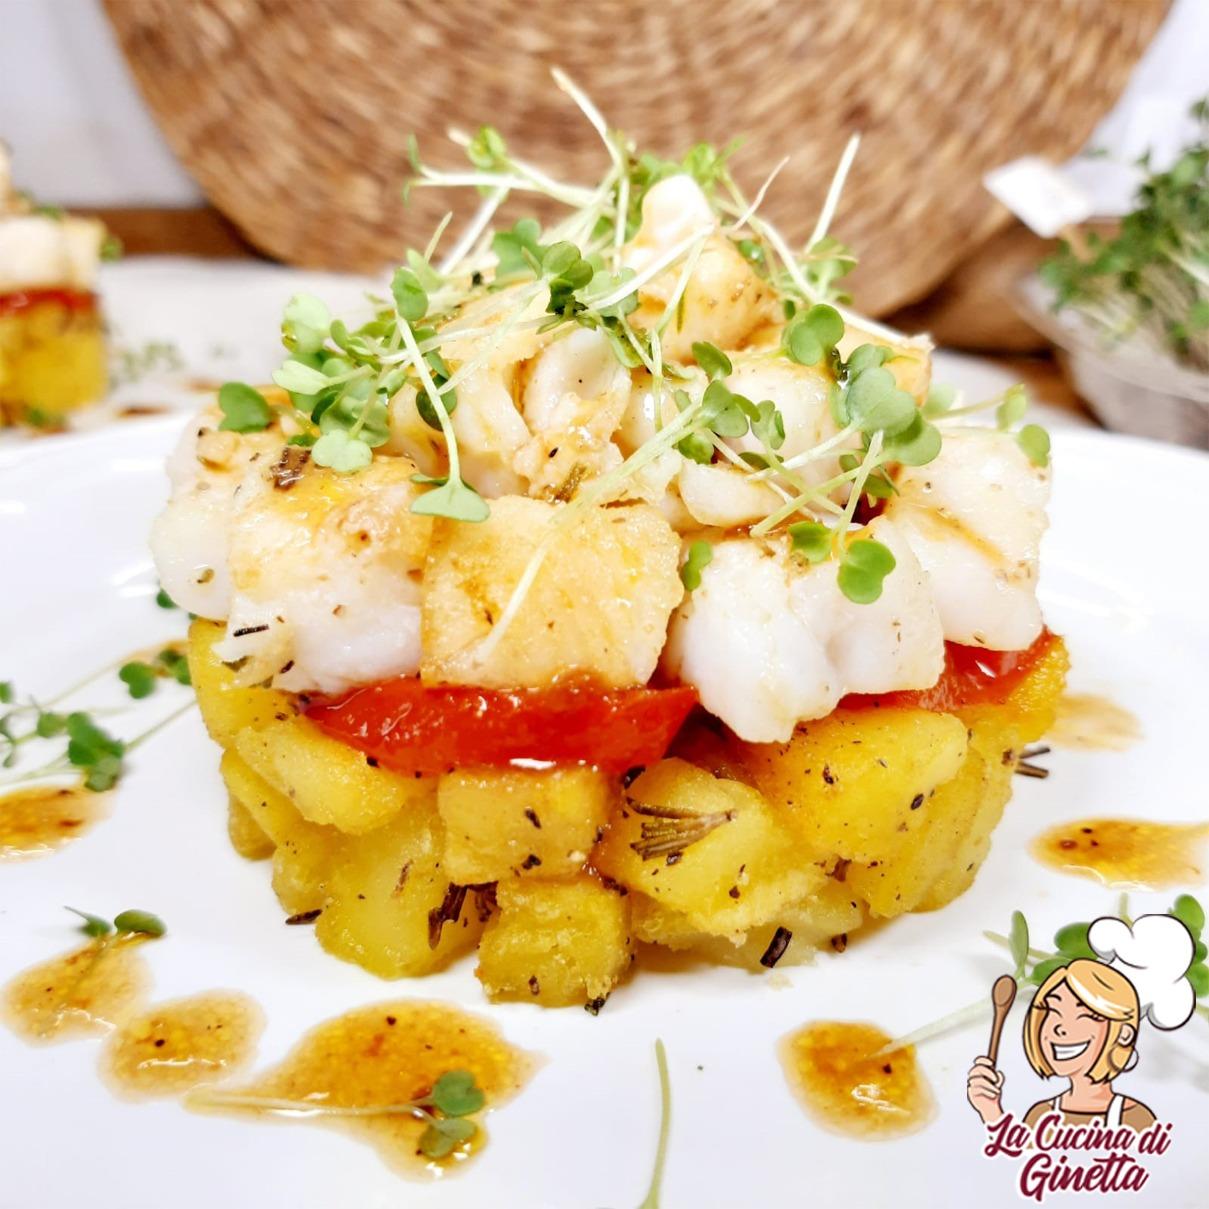 CUPOLA DI FISH AND CHIPS